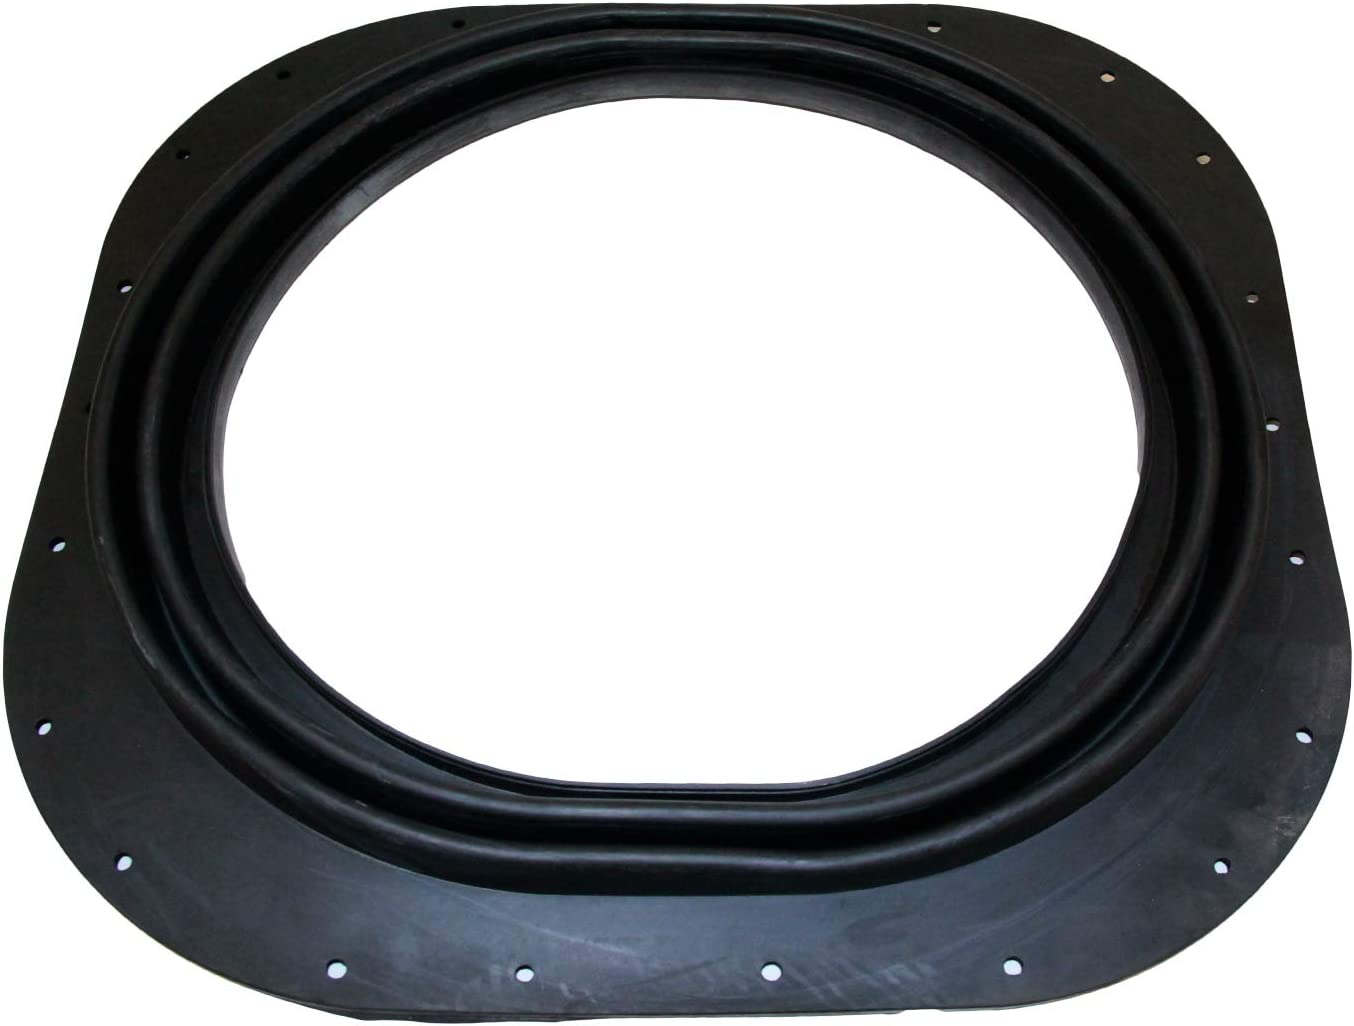 MTC 50038 / 909527 Transom Seal 22 Holes fits 1978-1986 OMC Stringer Sterndrive,Black